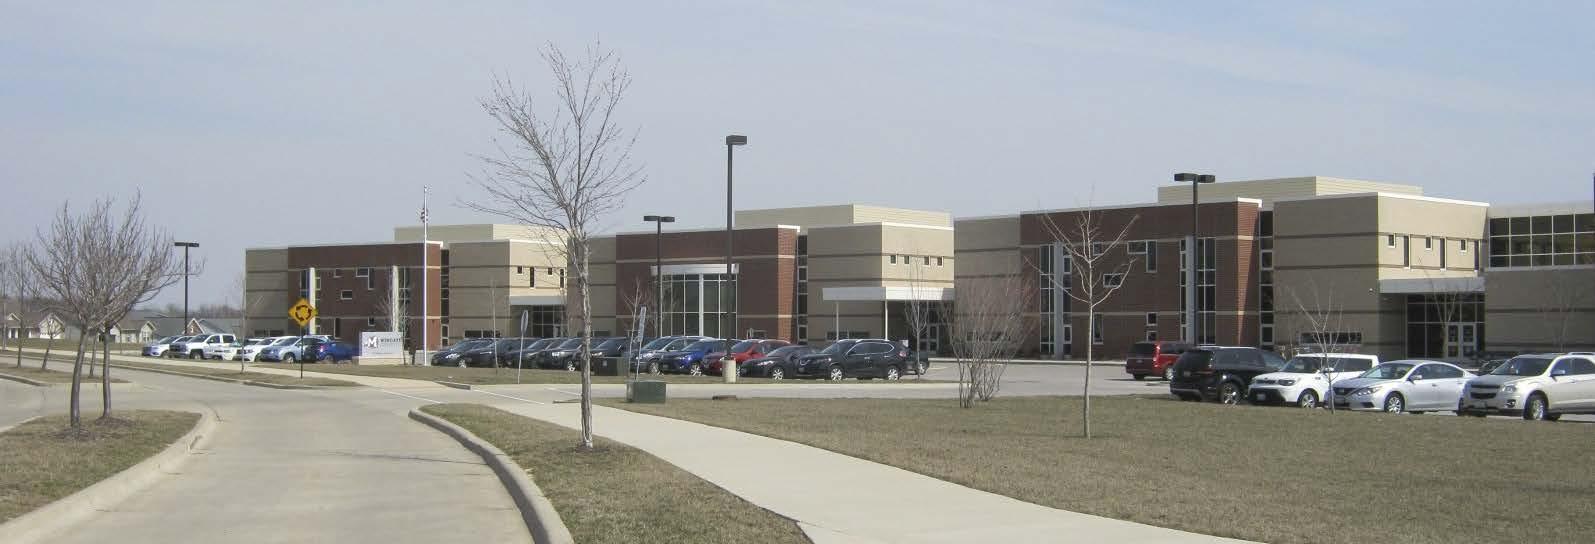 p13 Wingate Elementary School